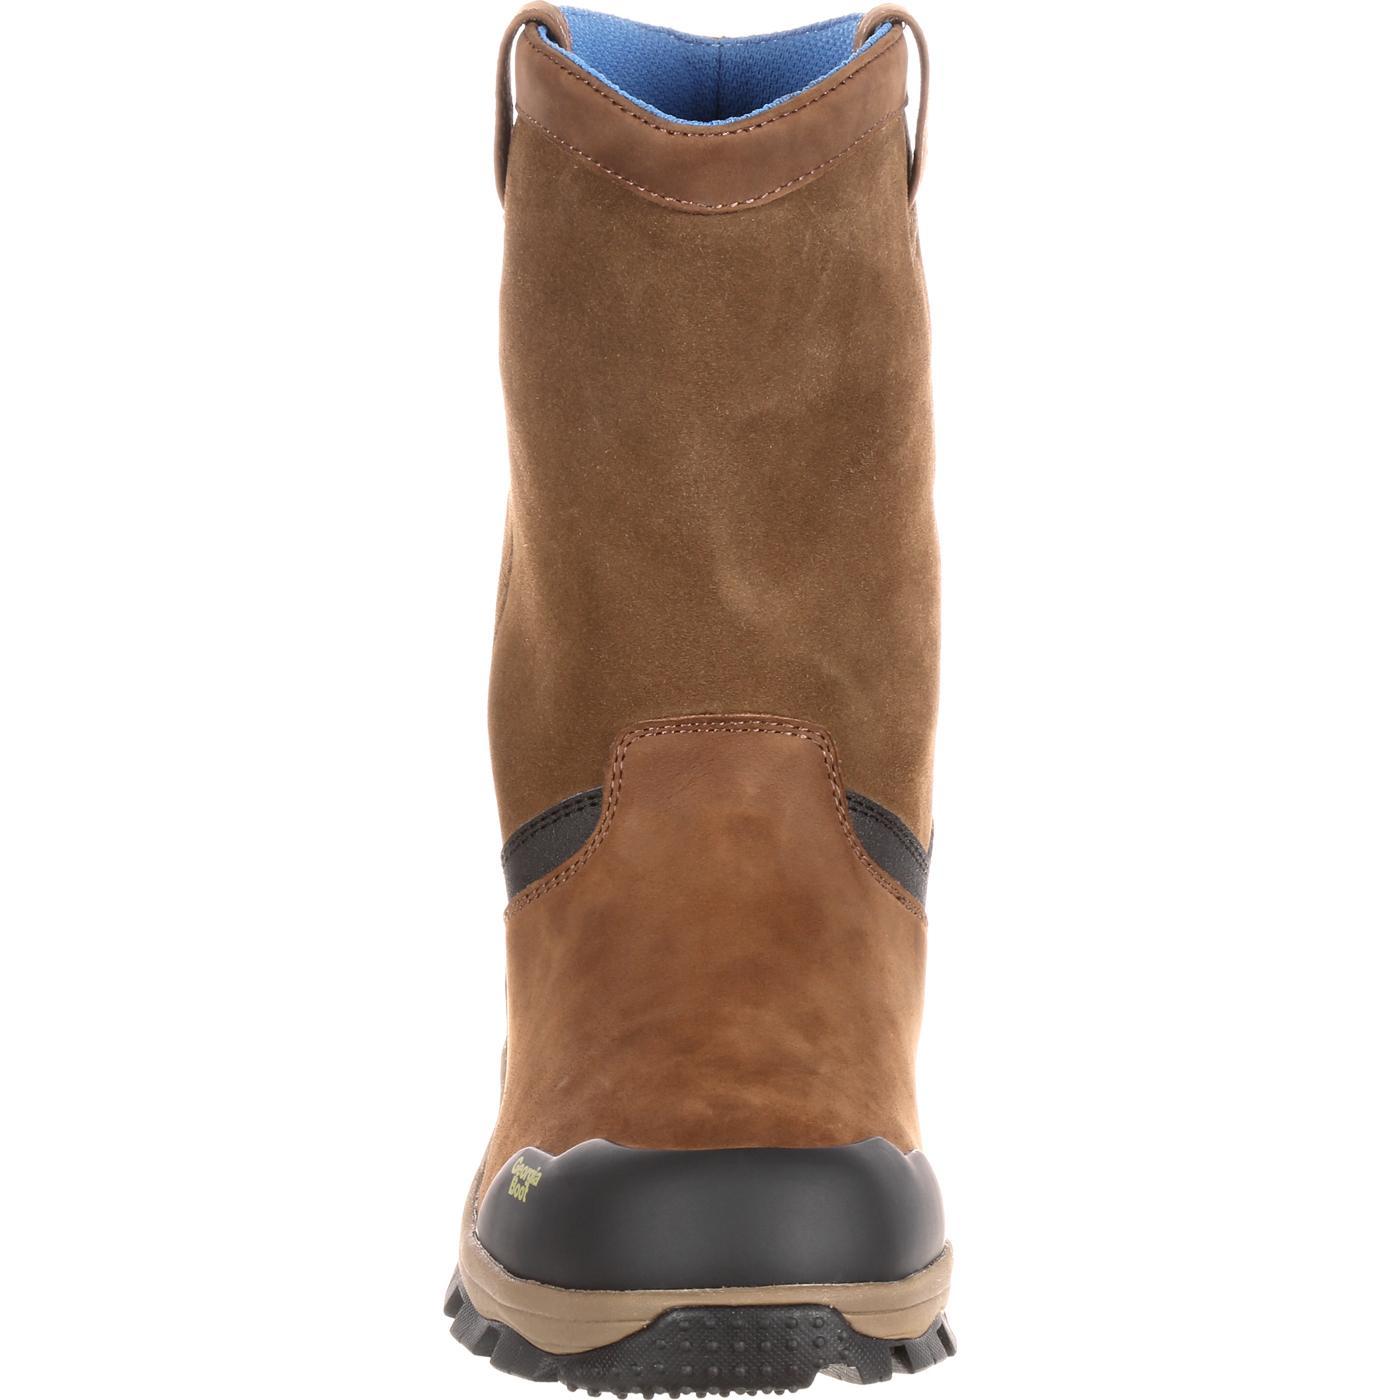 09650be9c96 Georgia Boot Blue Collar Waterproof Work Wellington